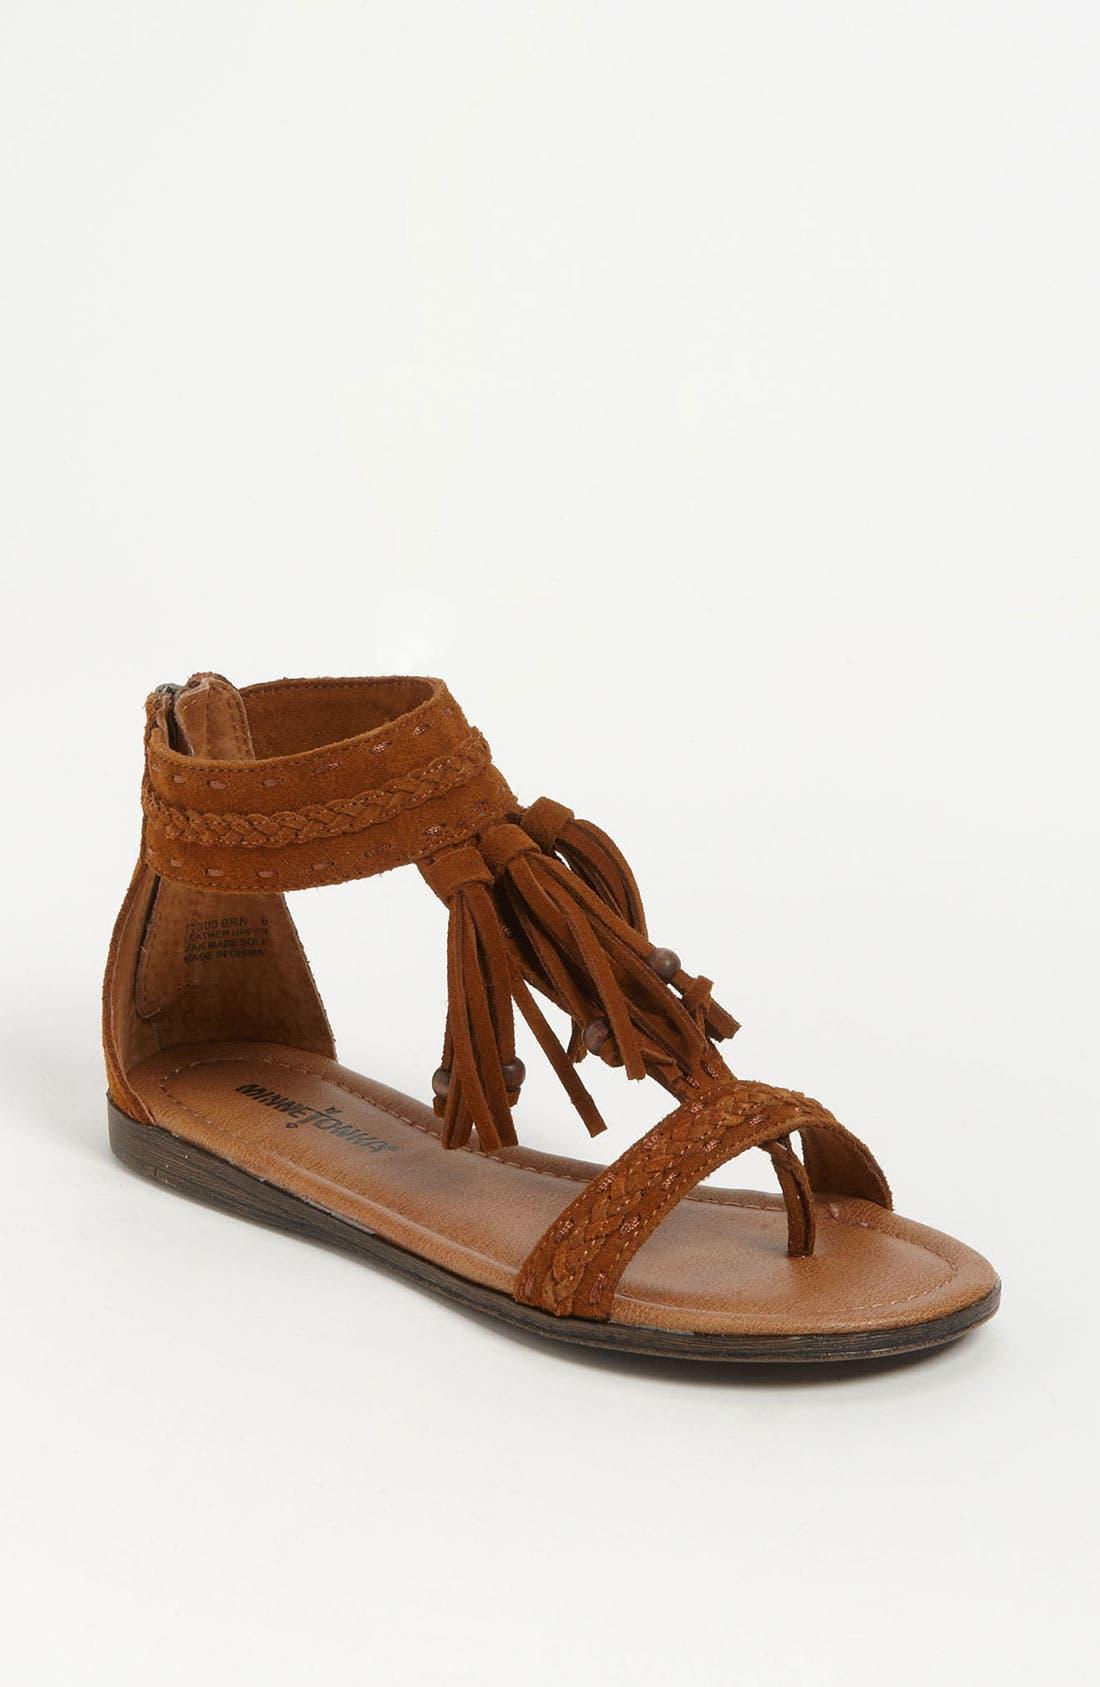 Main Image - Minnetonka 'Belize' Sandal